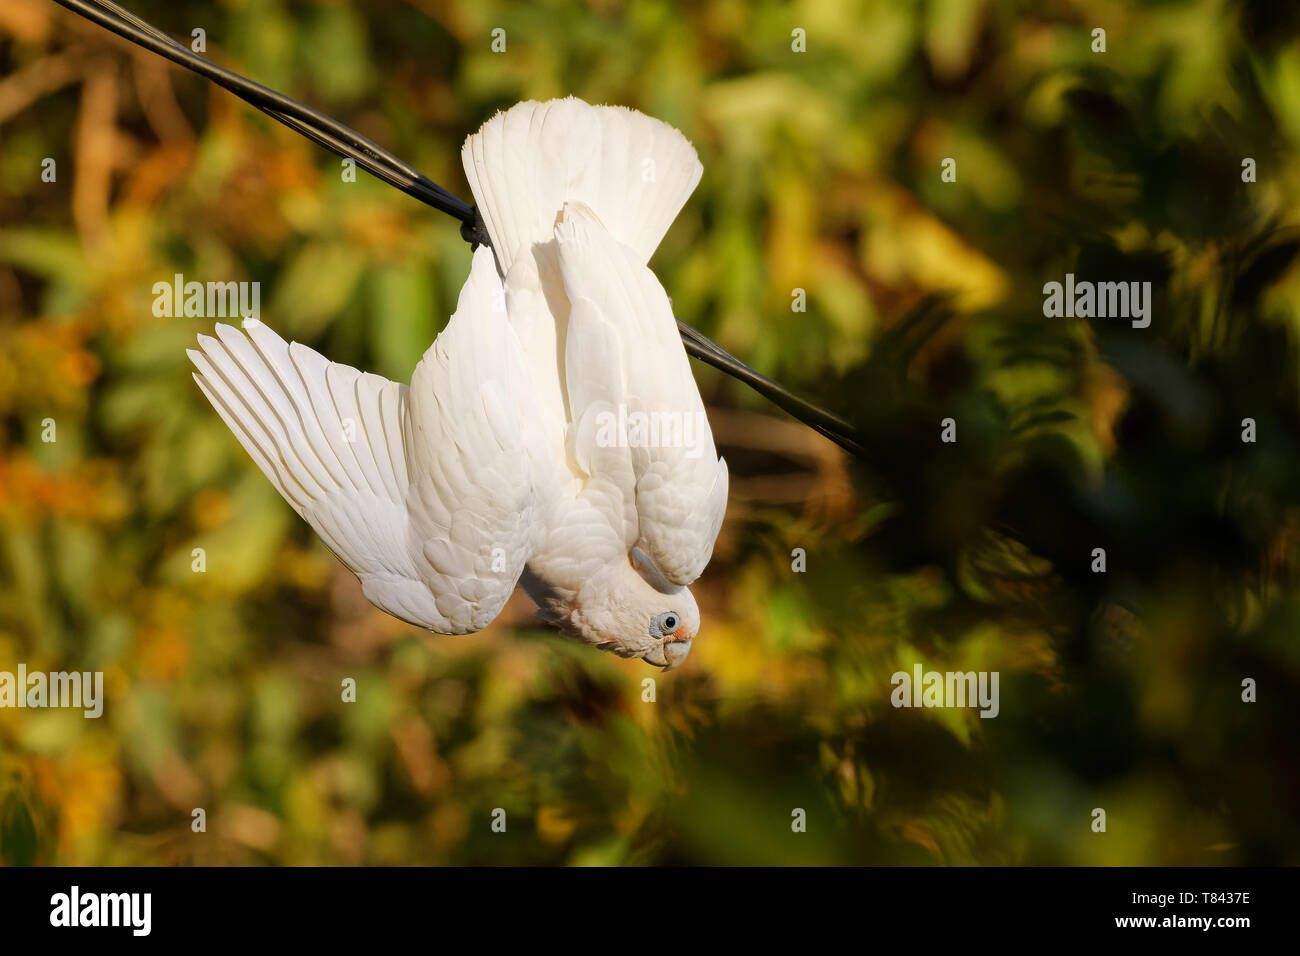 Little Corella - Cacatua sanguinea bird - feeding on the branch near Melbourne, Australia. Stock Photo